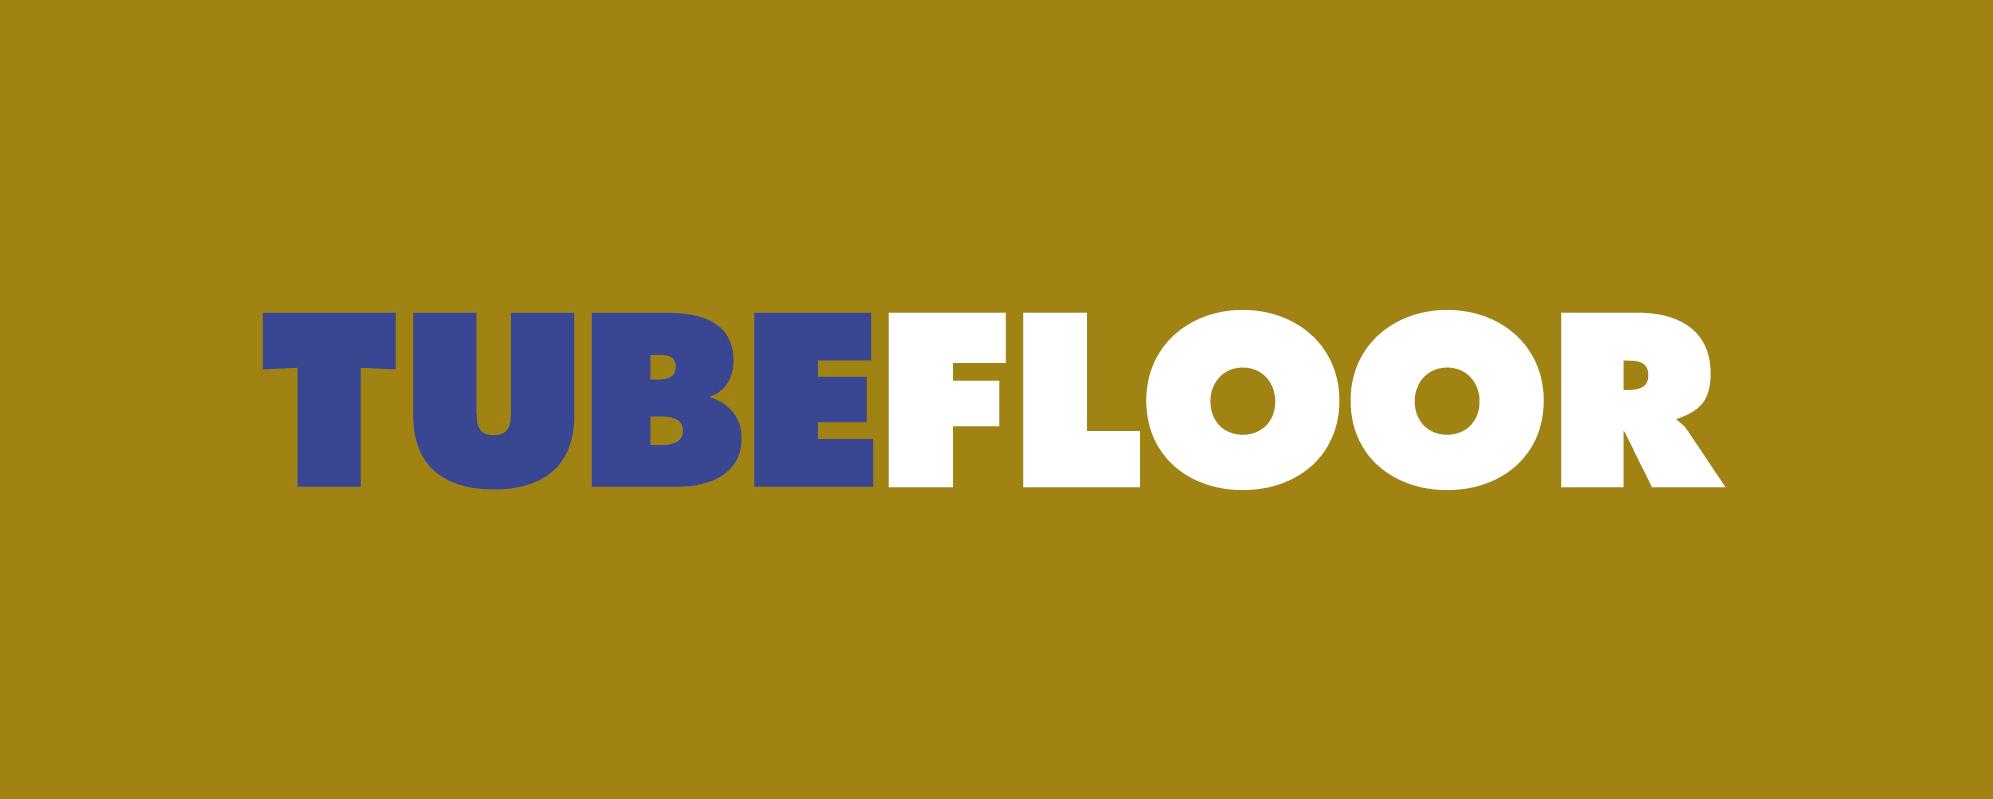 logo-tubefloor-huistopper-witzand-bouwmaterialen